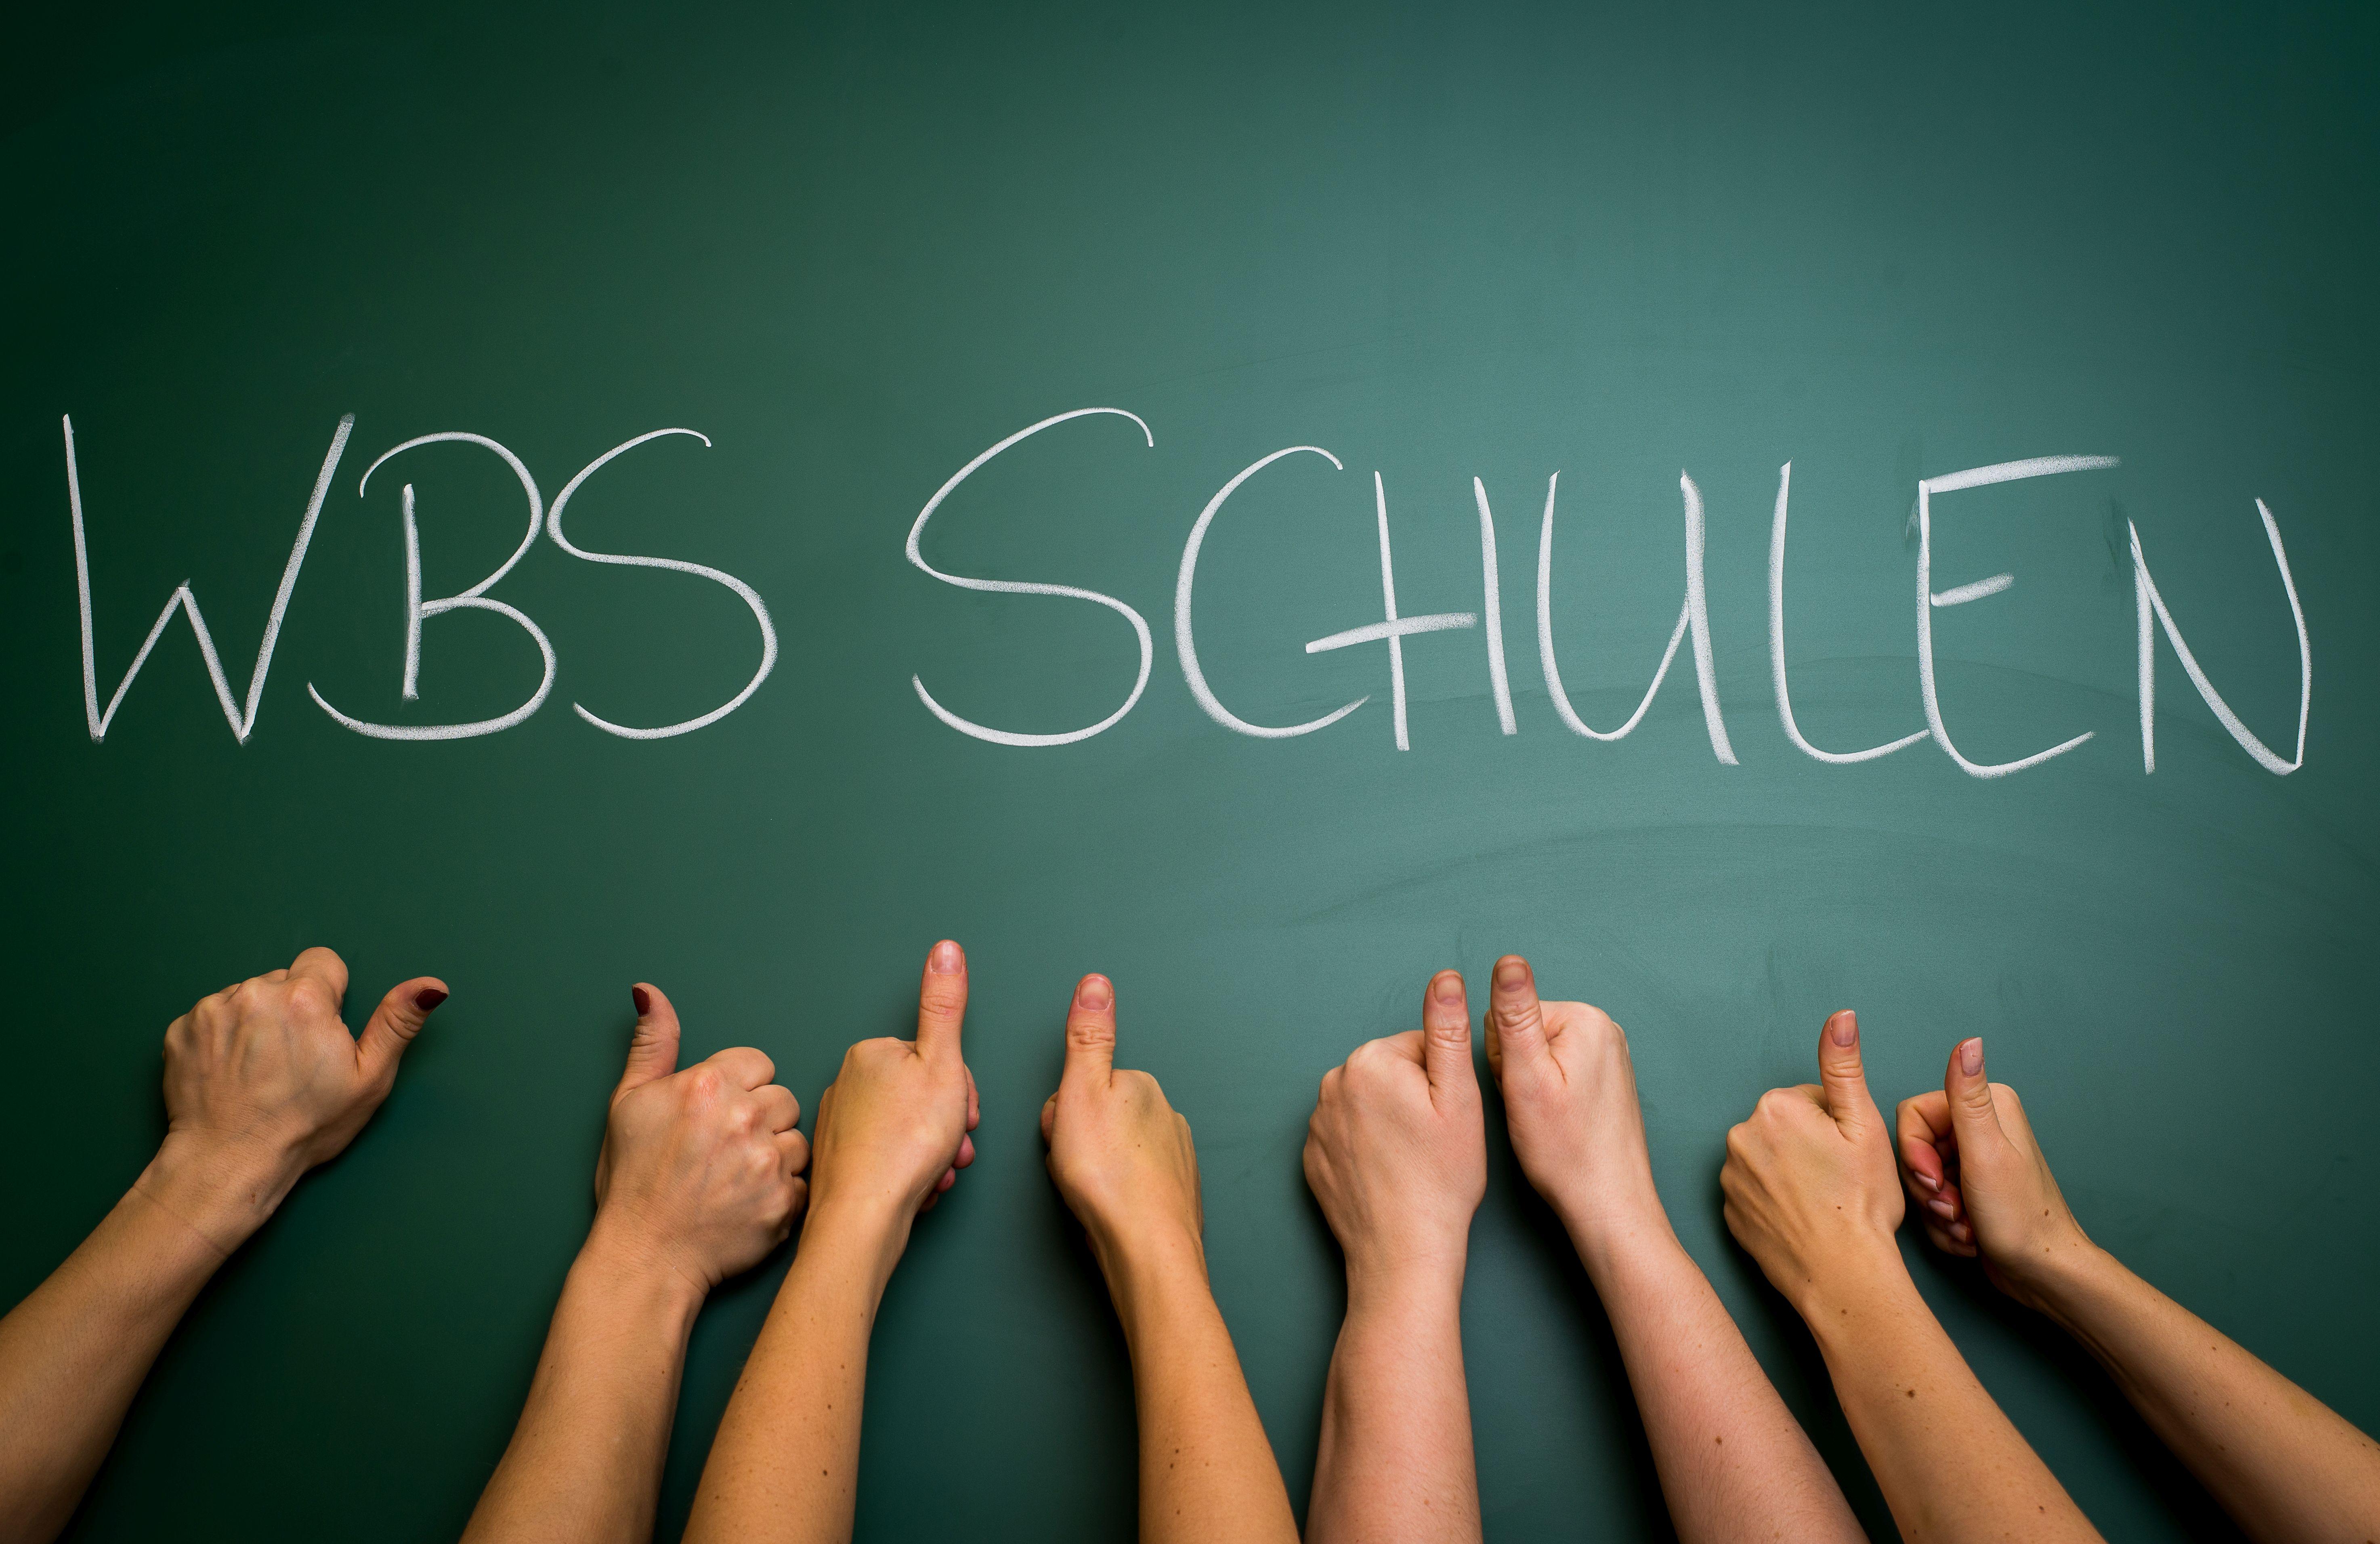 WBS SCHULEN Leipzig